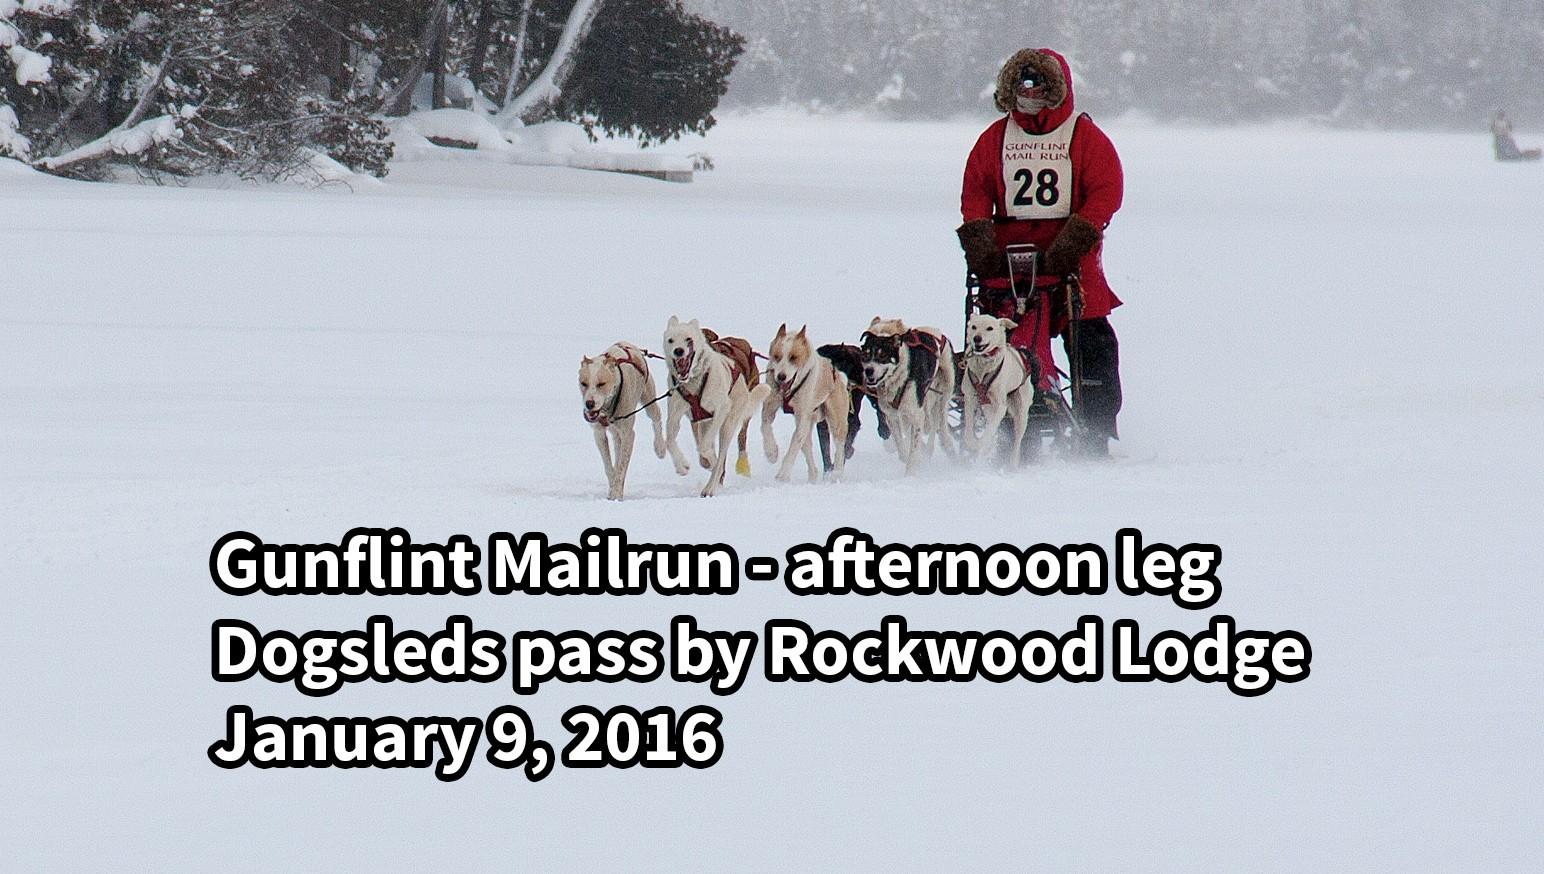 Gunflint Mailrun Dogsleds